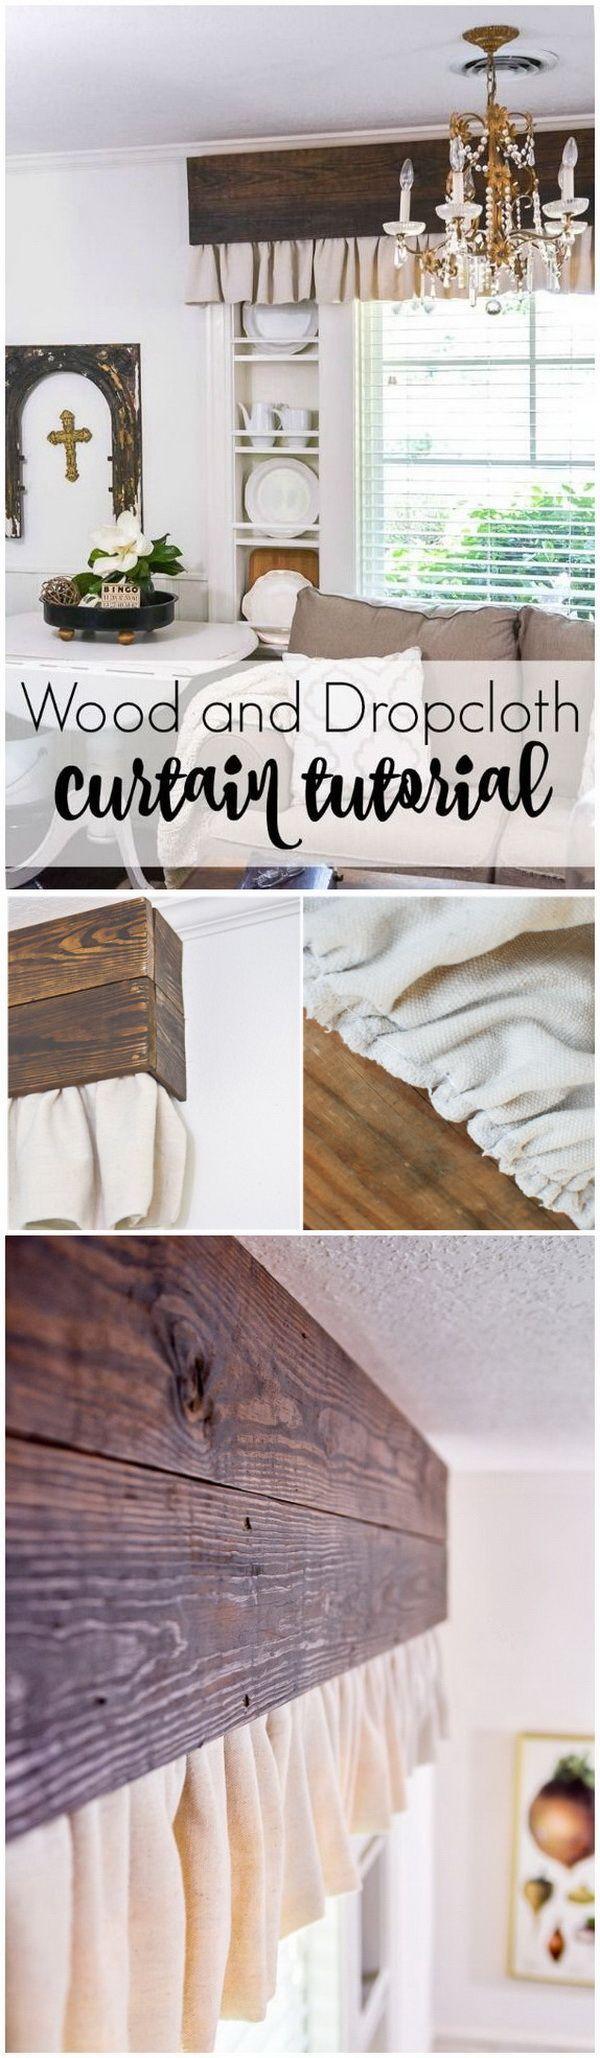 Diy Wood Cornice Best 25 Wood Window Valances Ideas On Pinterest Window Valance